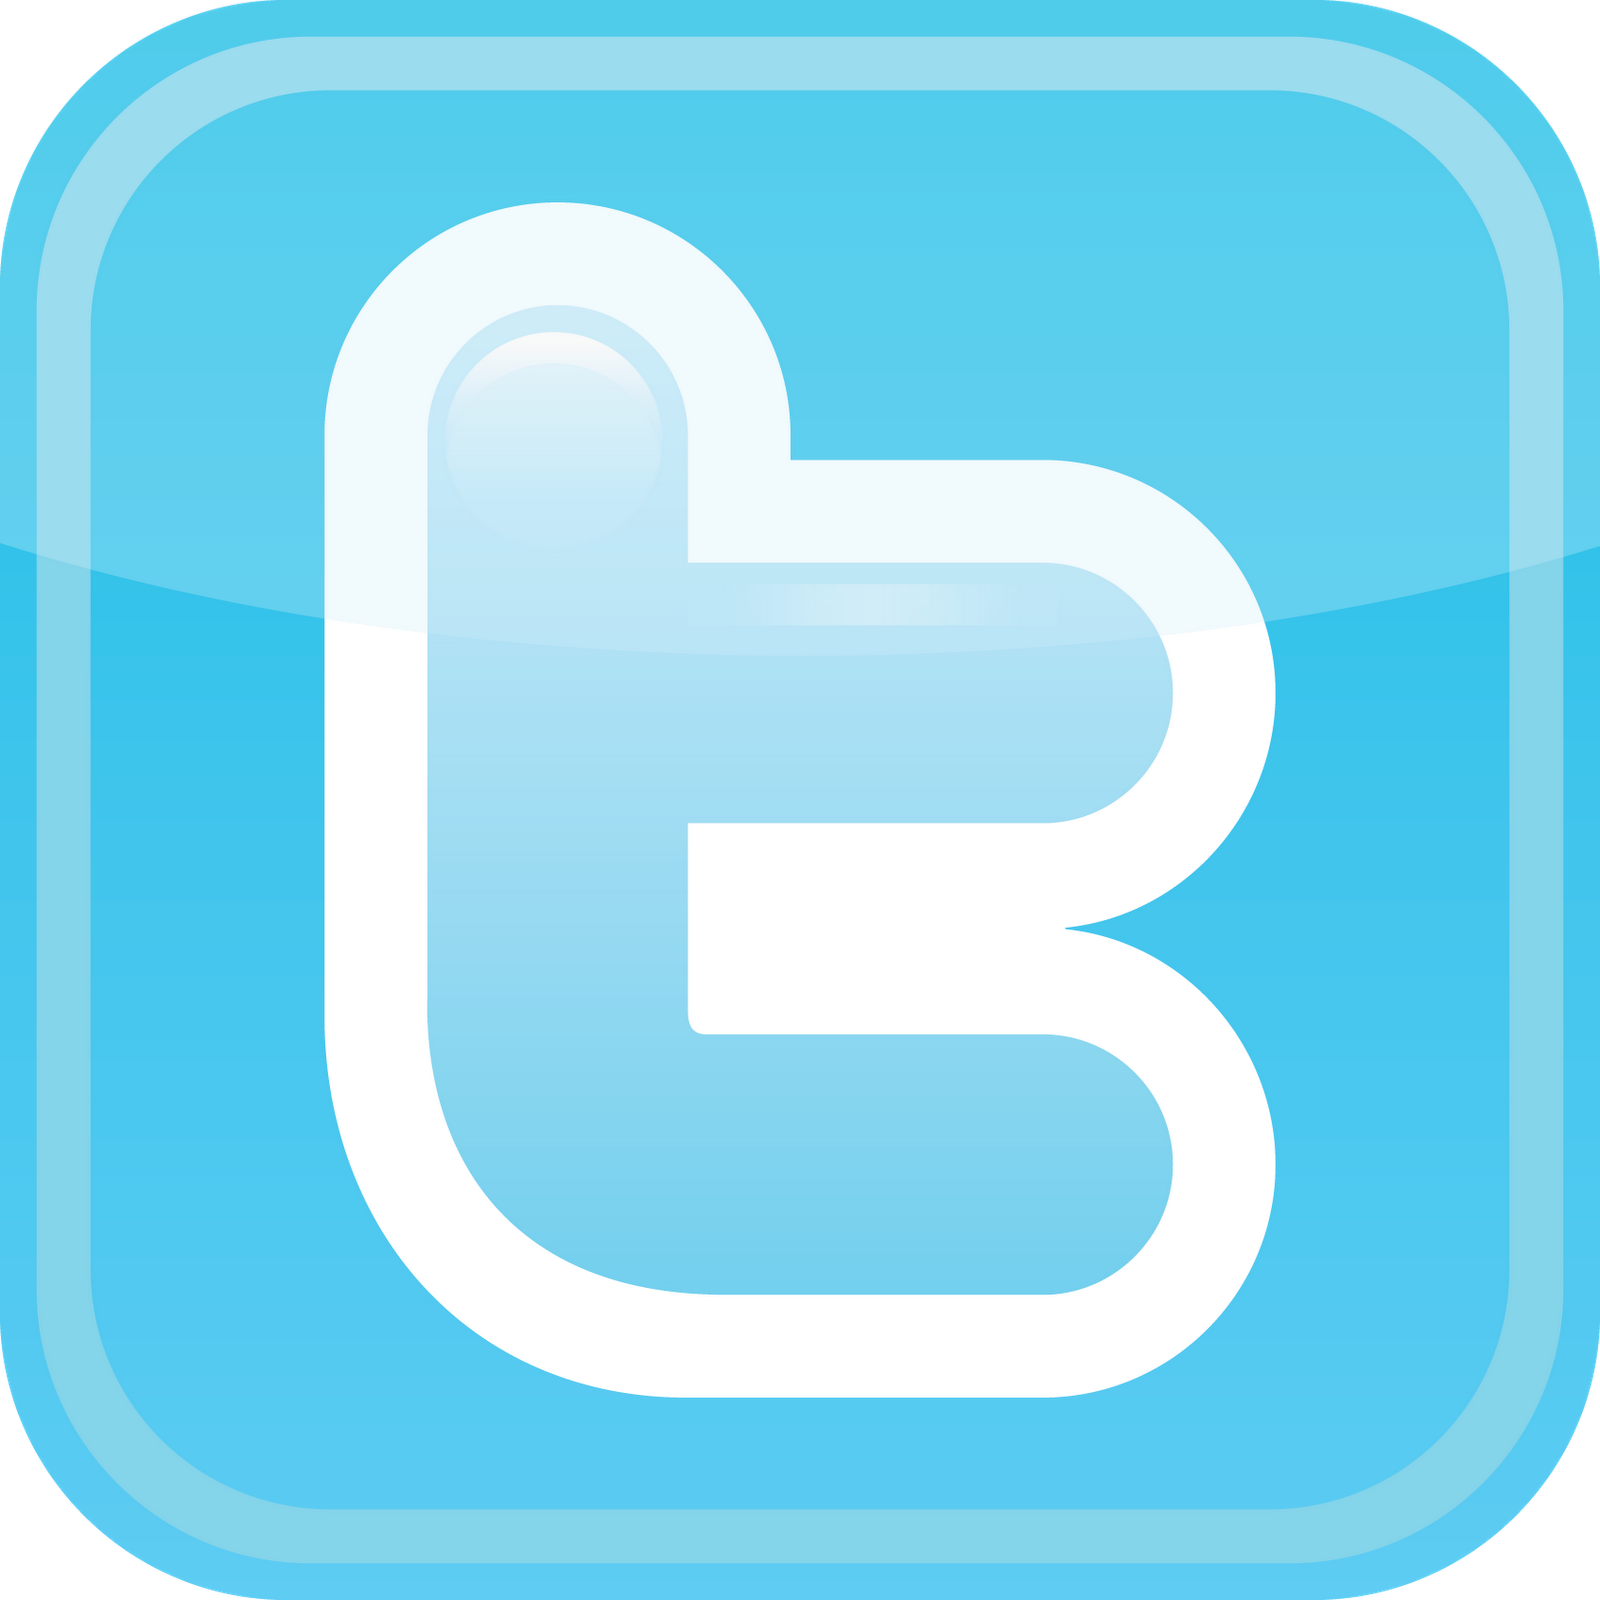 Twitter Logo Vector Png.